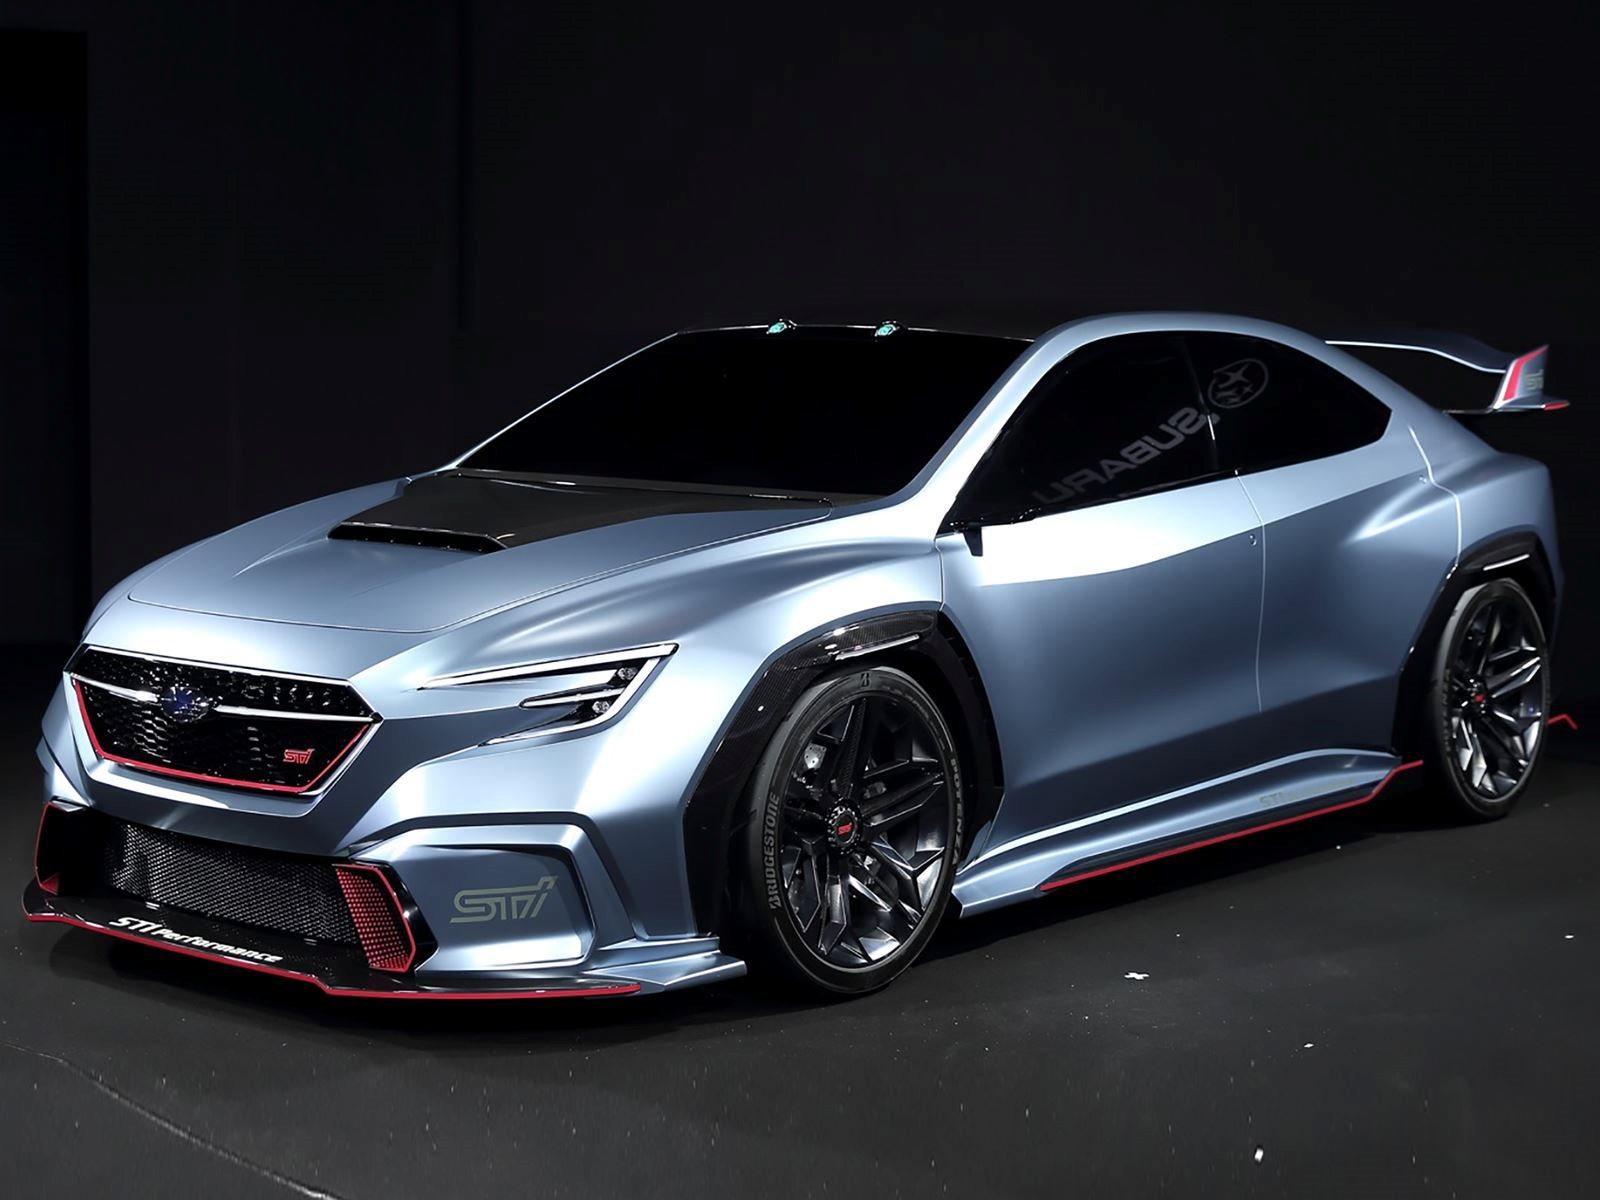 Subaru S Latest Sports Car Concept Previews The New Wrx Sti Carbuzz